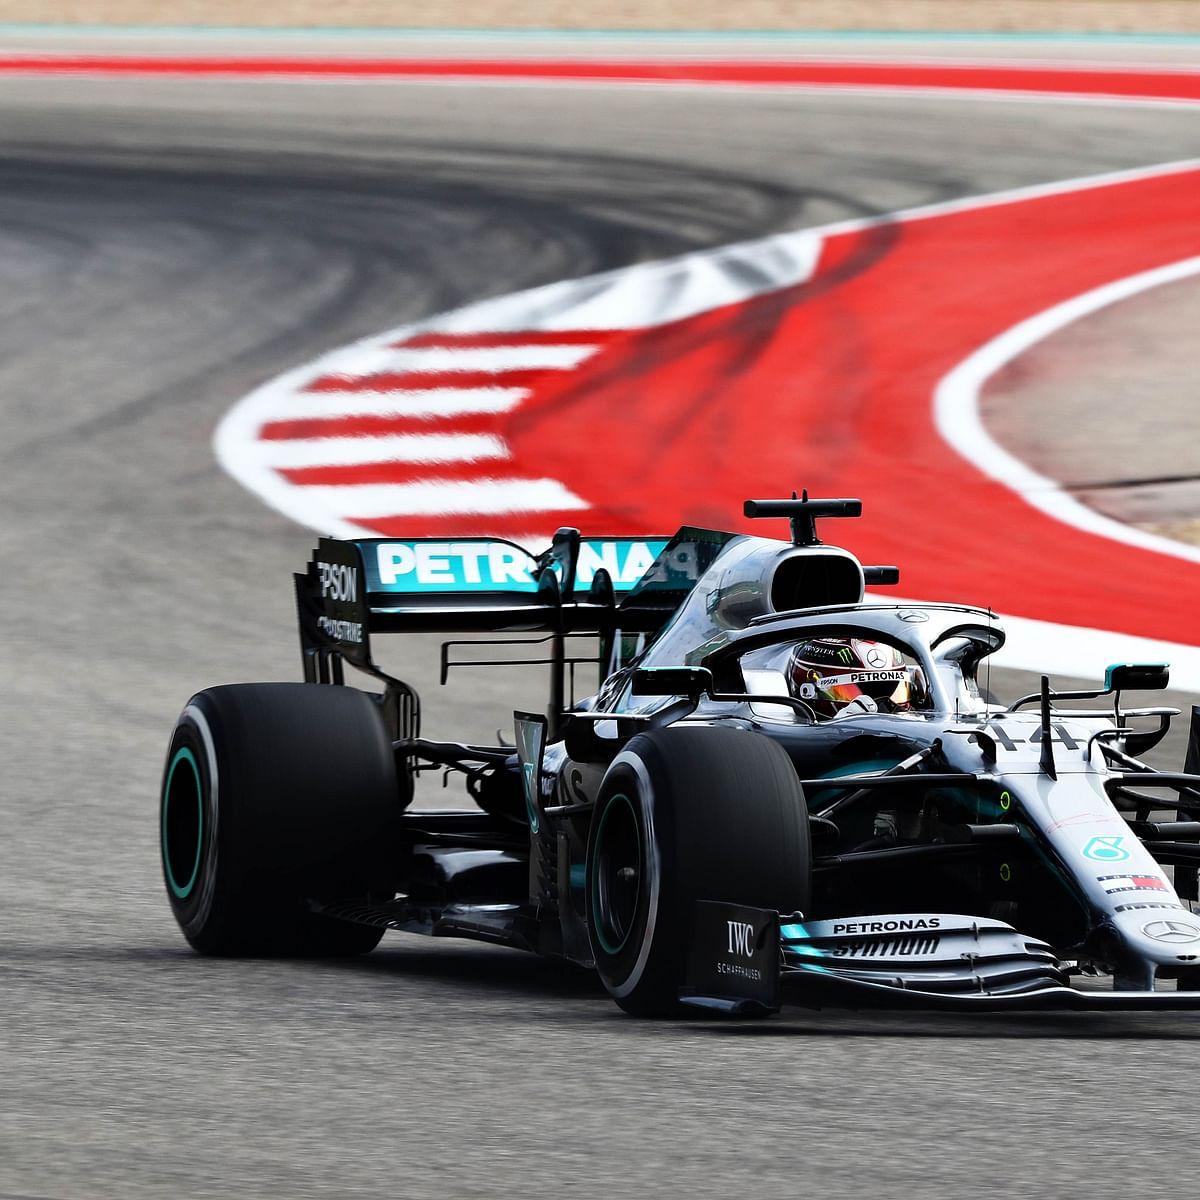 Formula One: Lewis Hamilton tops charts